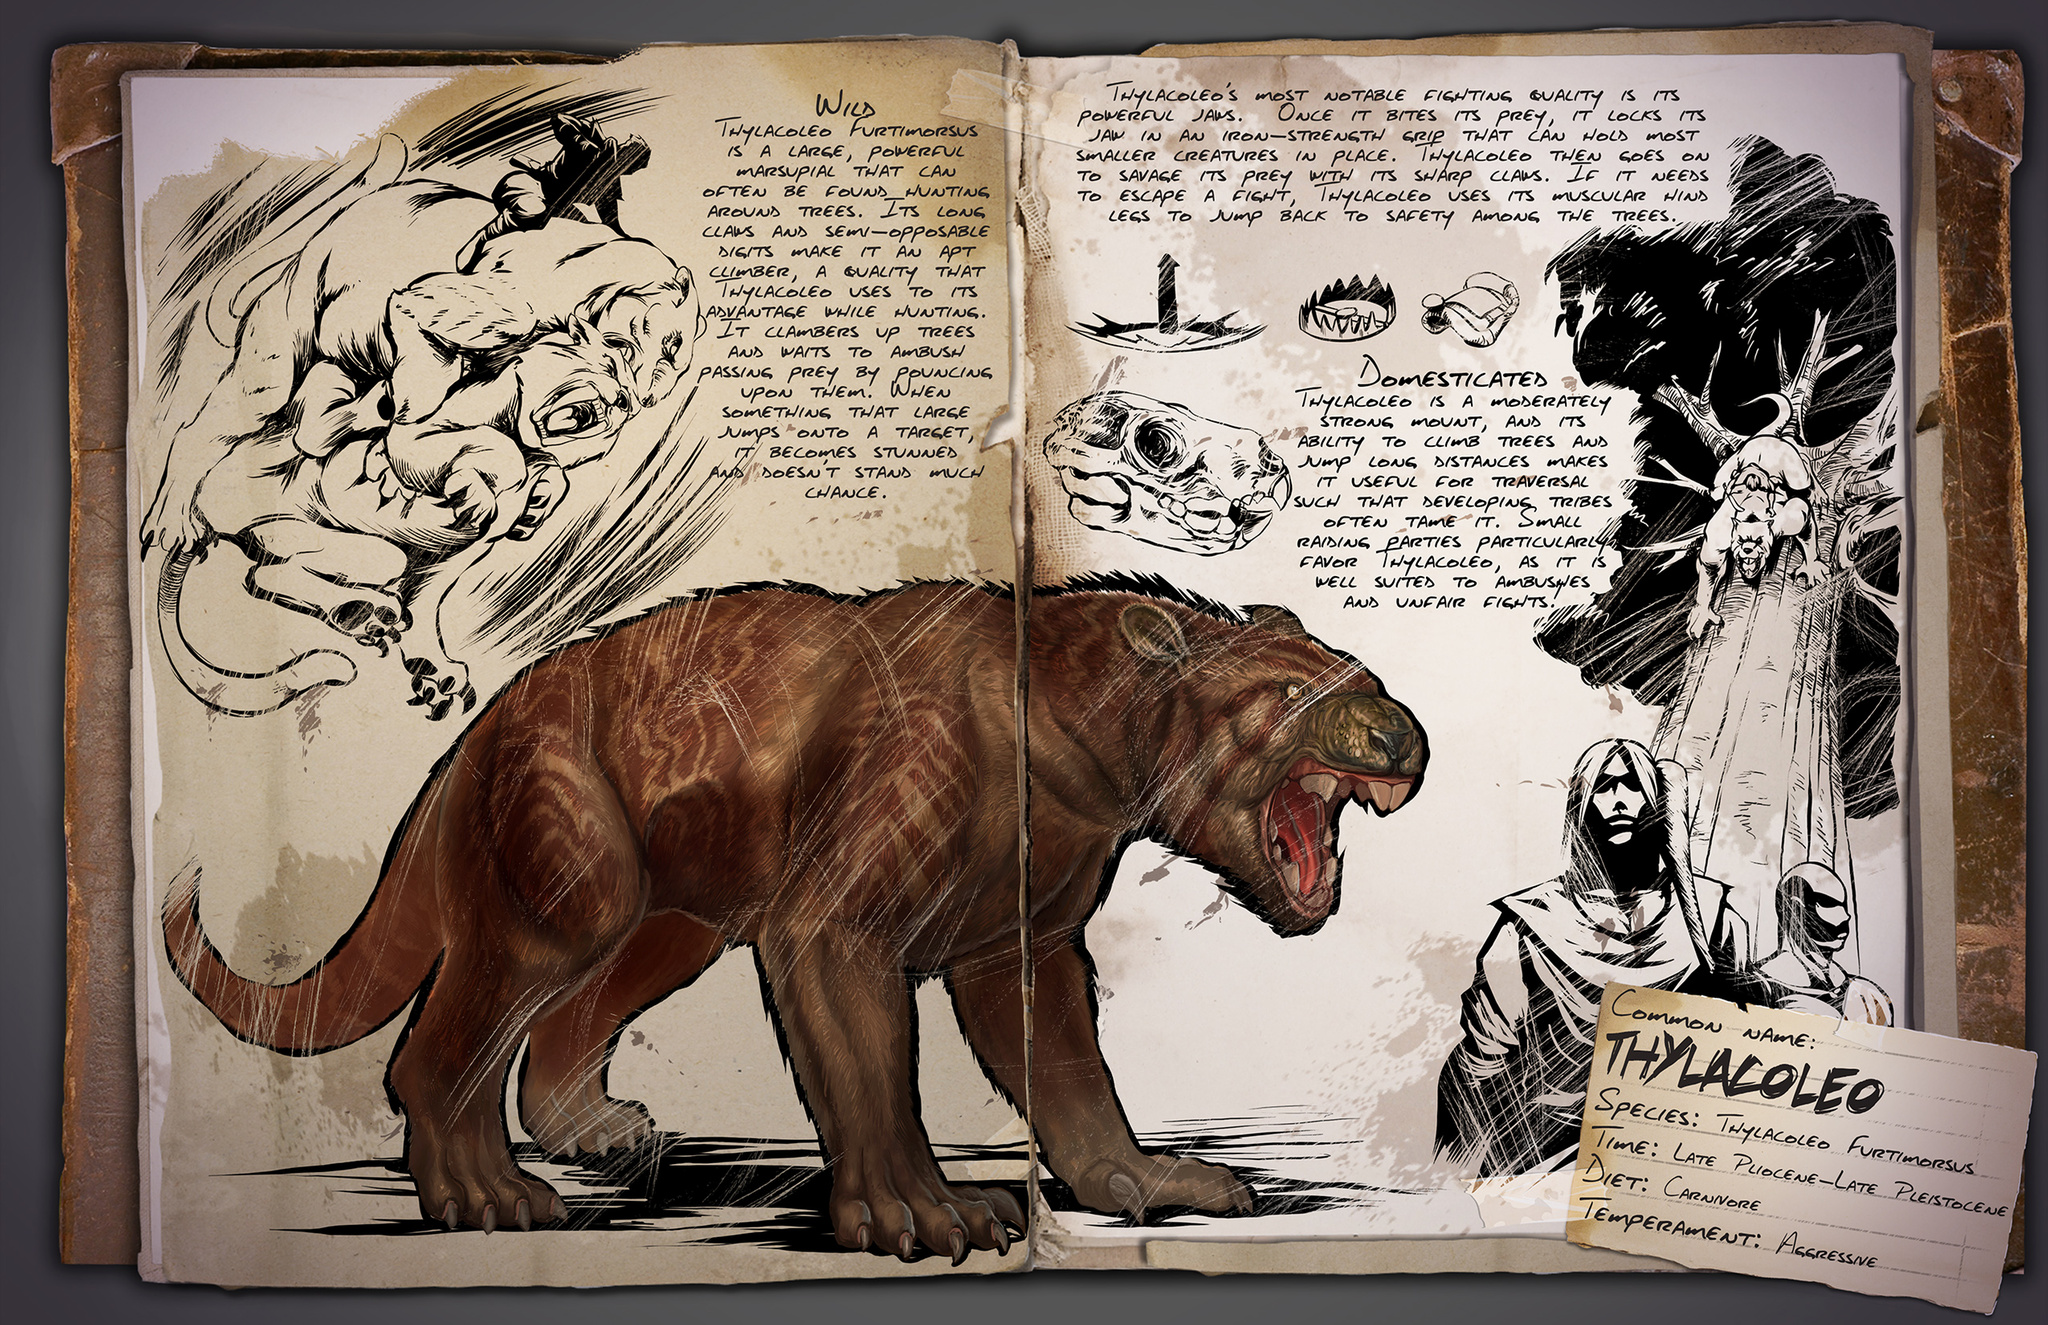 Dino Dossier: Thylacoleo